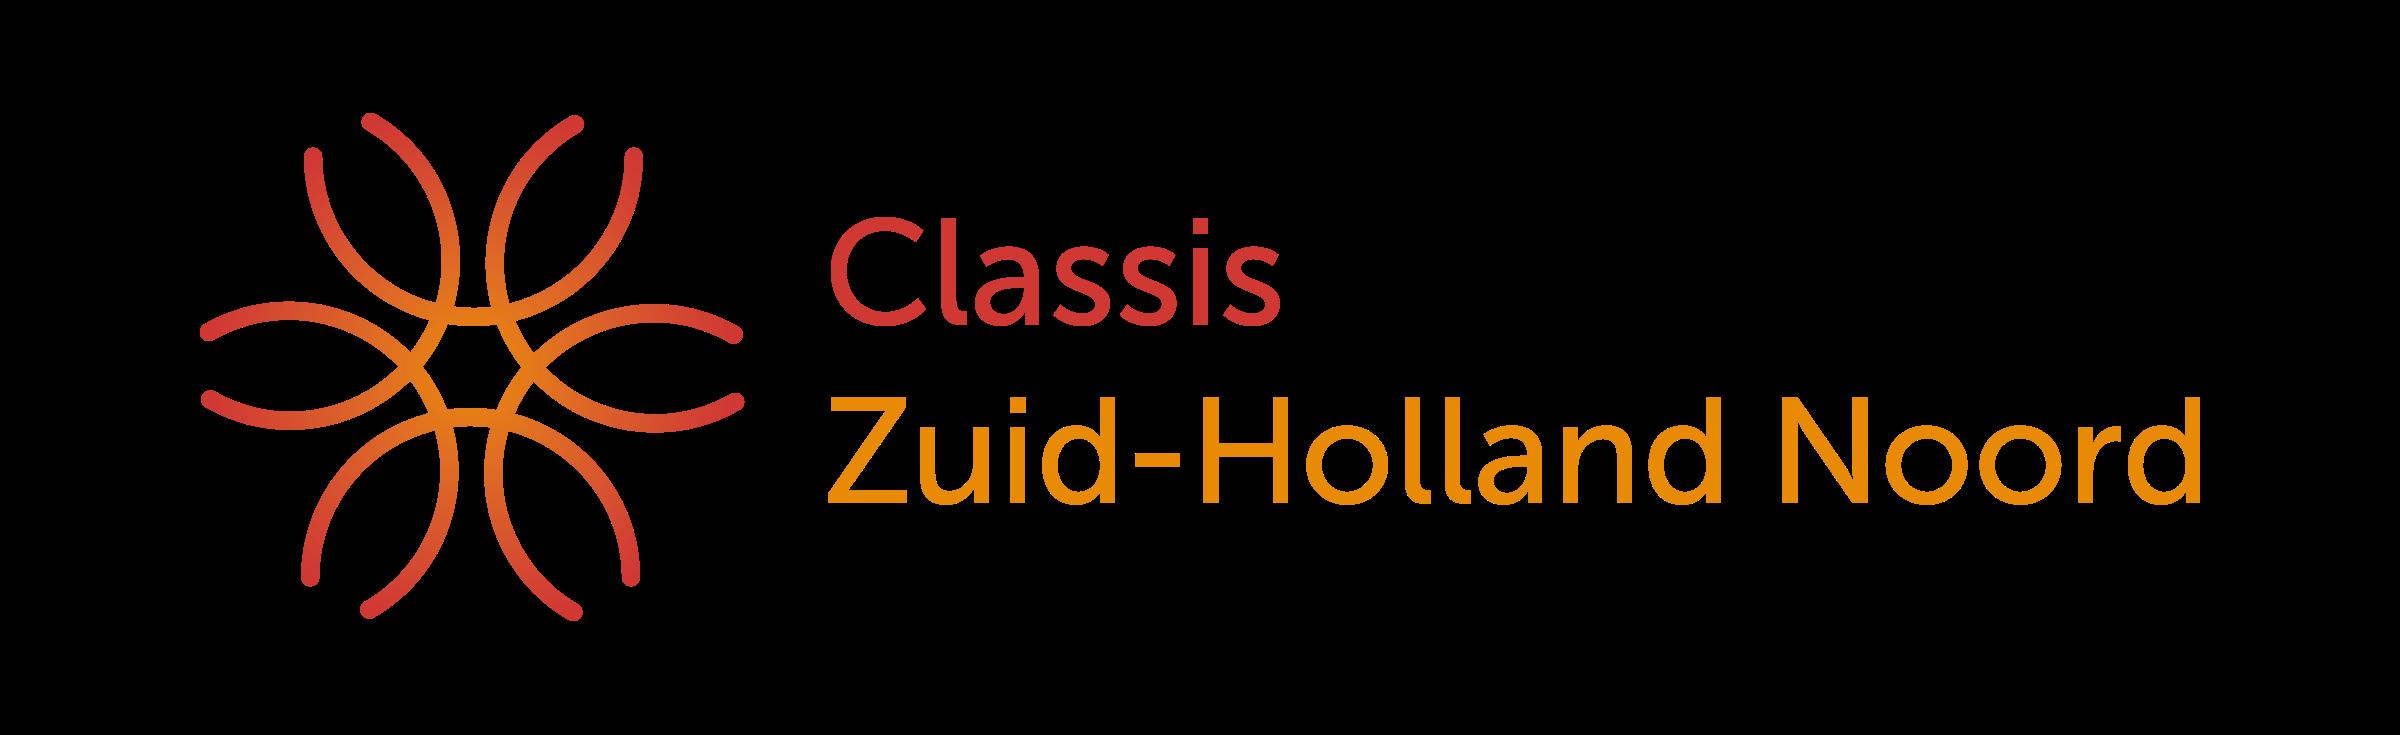 Logo Classis Zuid-Holland Noord